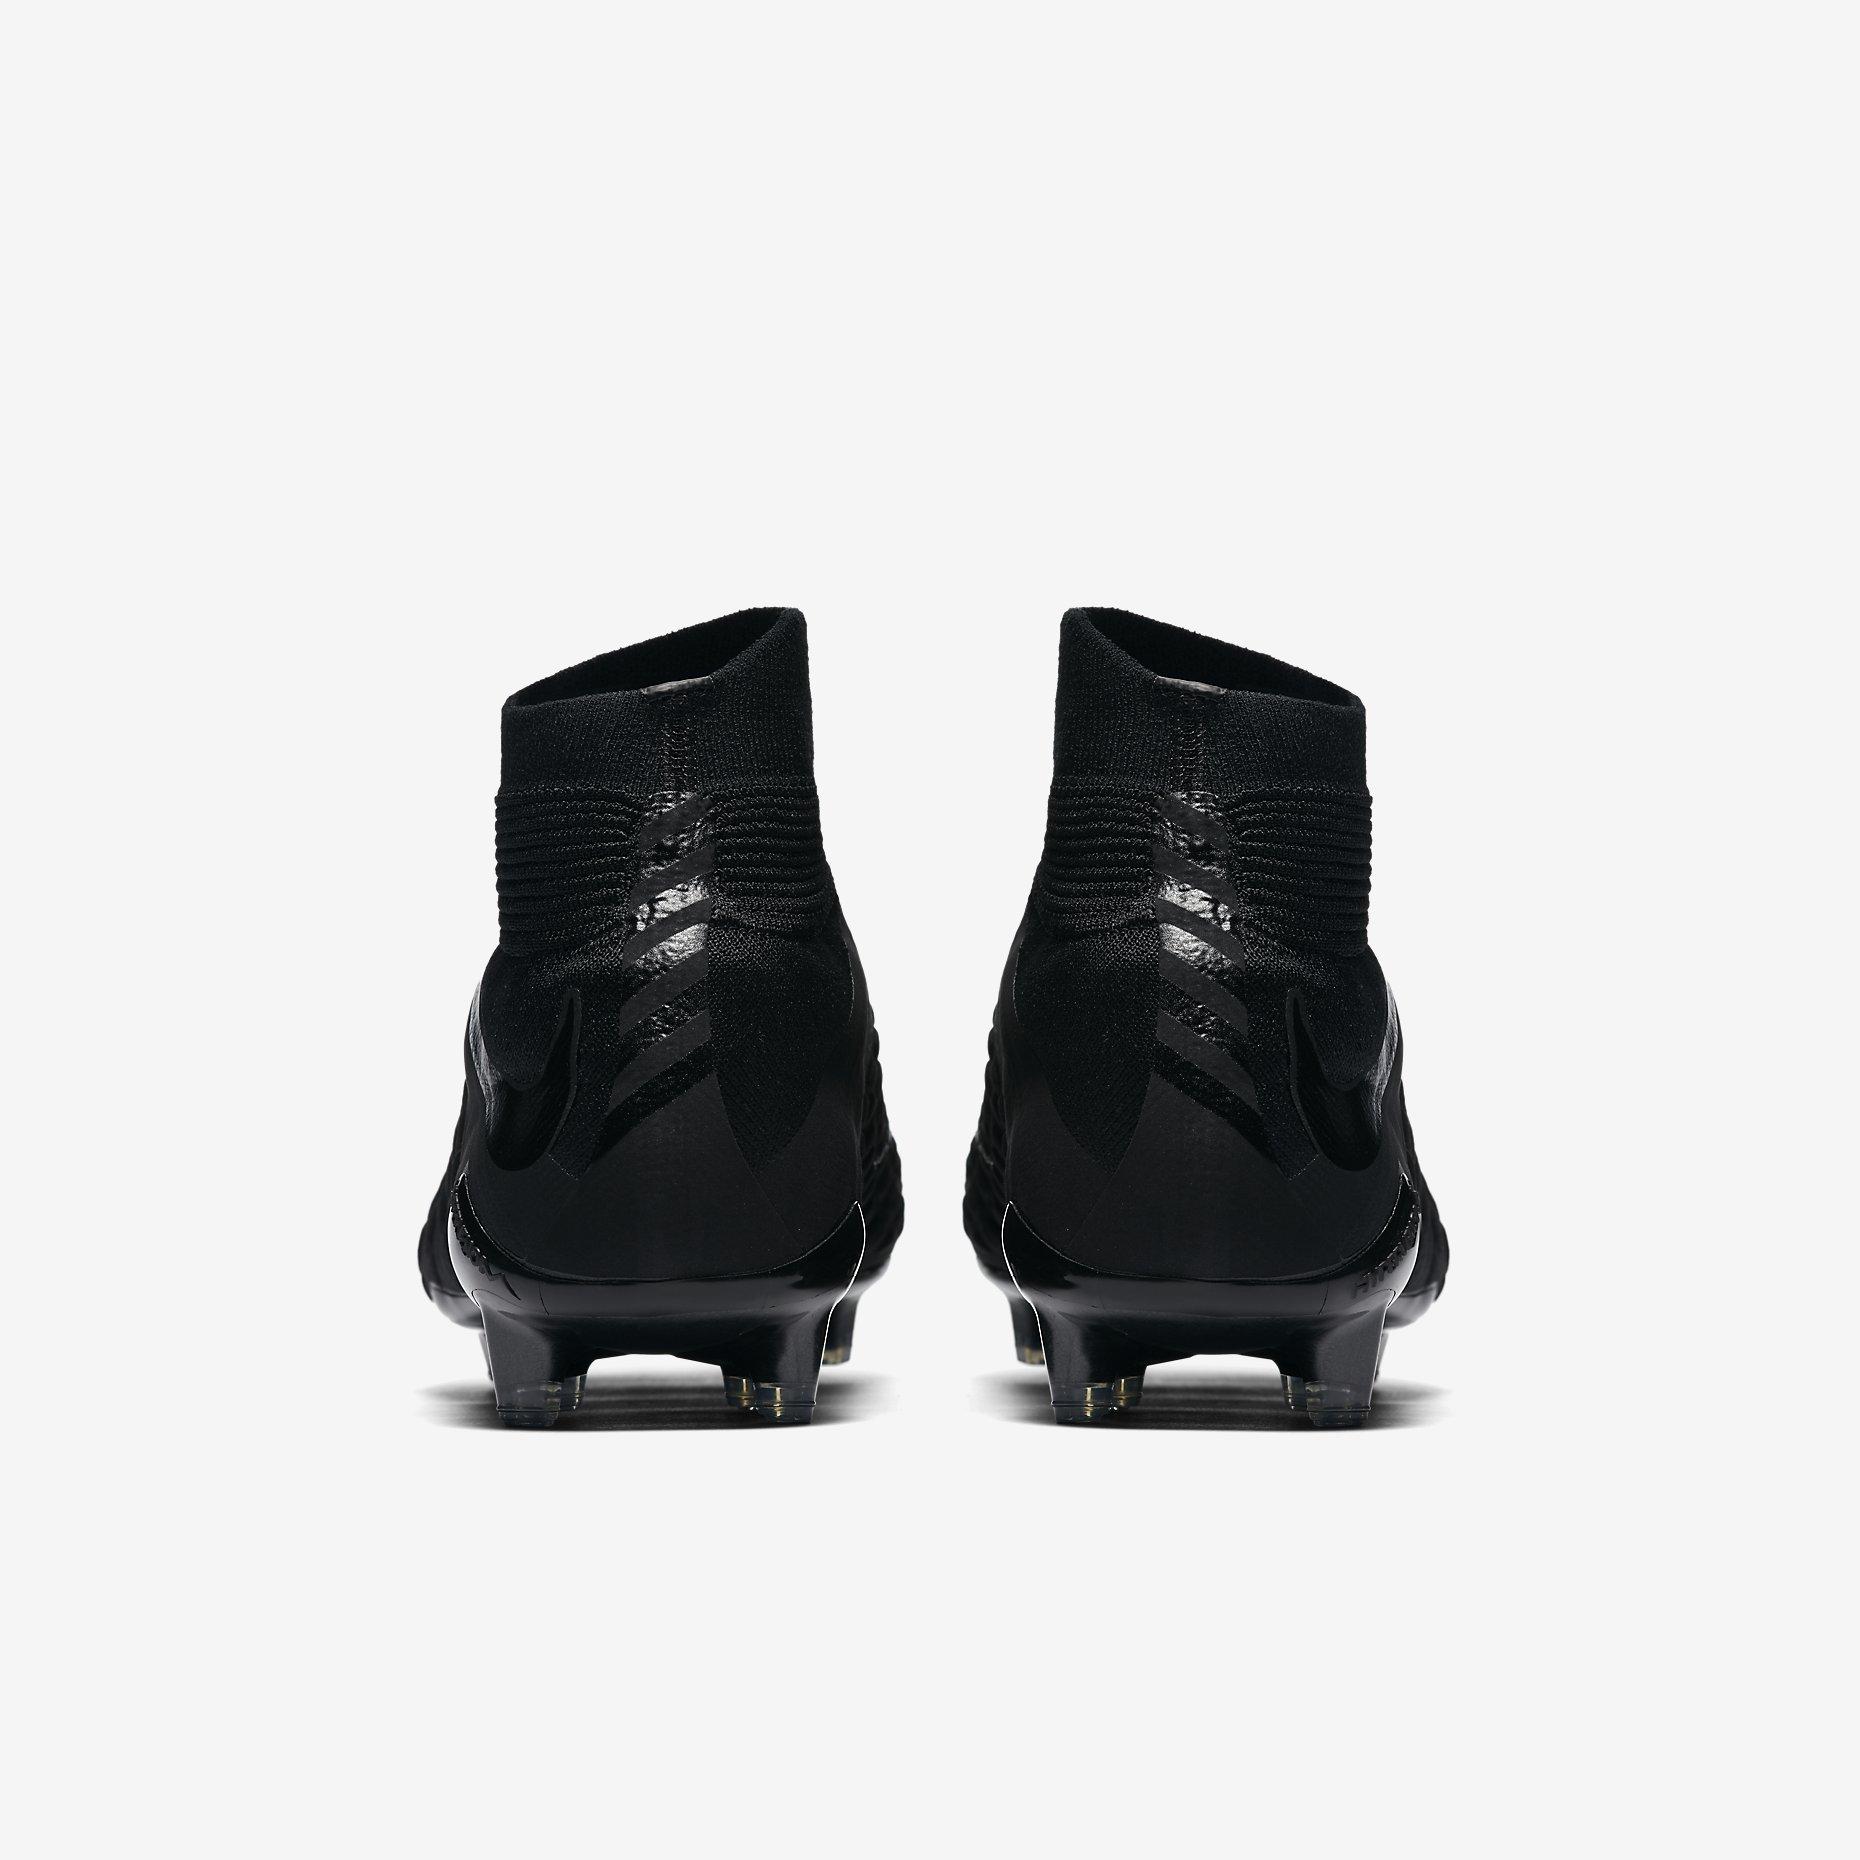 Deshabilitar De Verdad Al frente  Nike Hypervenom Phantom 3 DF FG Academy Pack - Black / Black / Black |  Football boots | Football shirt blog